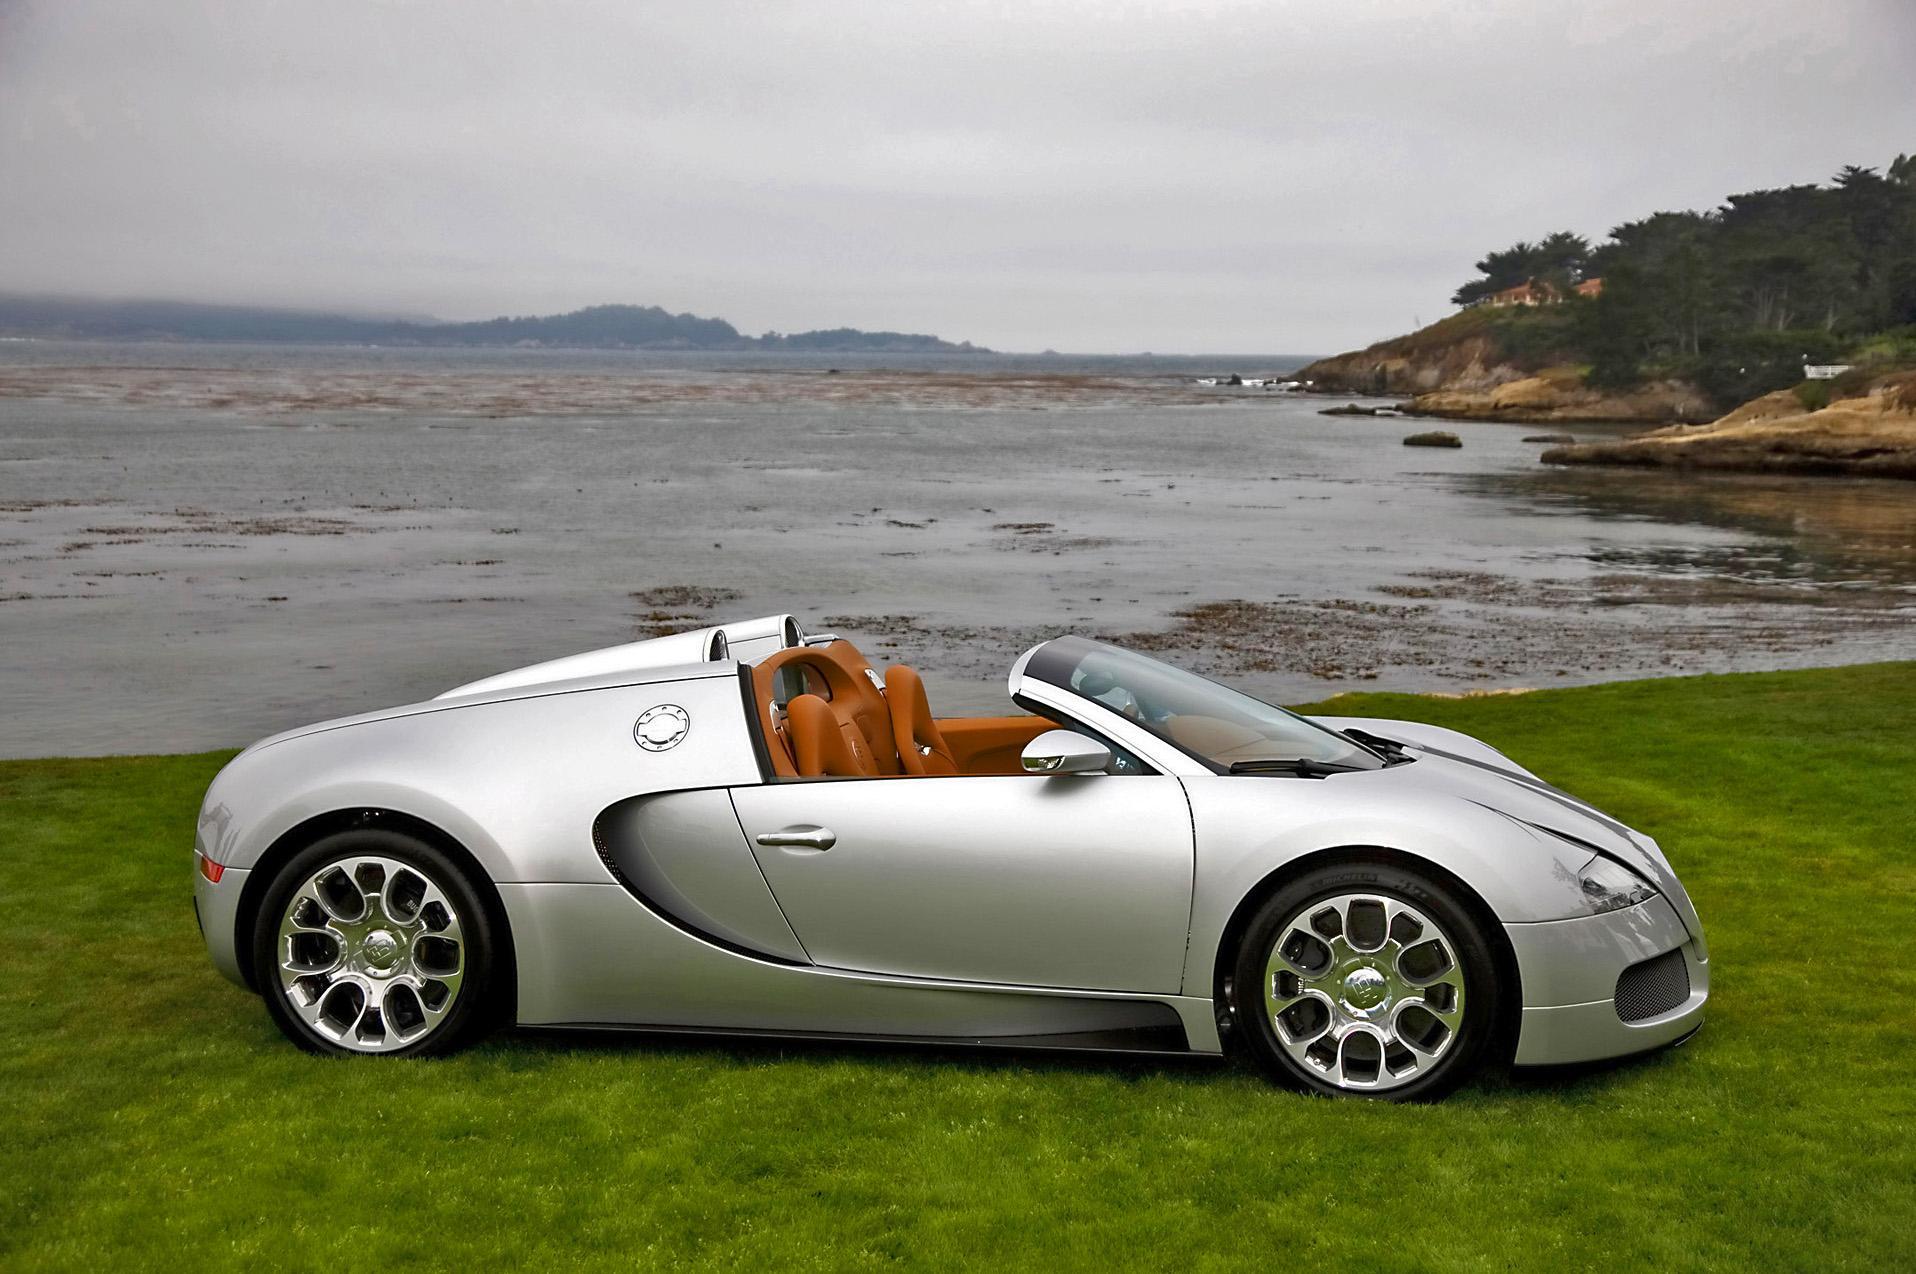 2009 bugatti 16 4 veyron grand sport desktop wallpaper and high resolution im. Black Bedroom Furniture Sets. Home Design Ideas